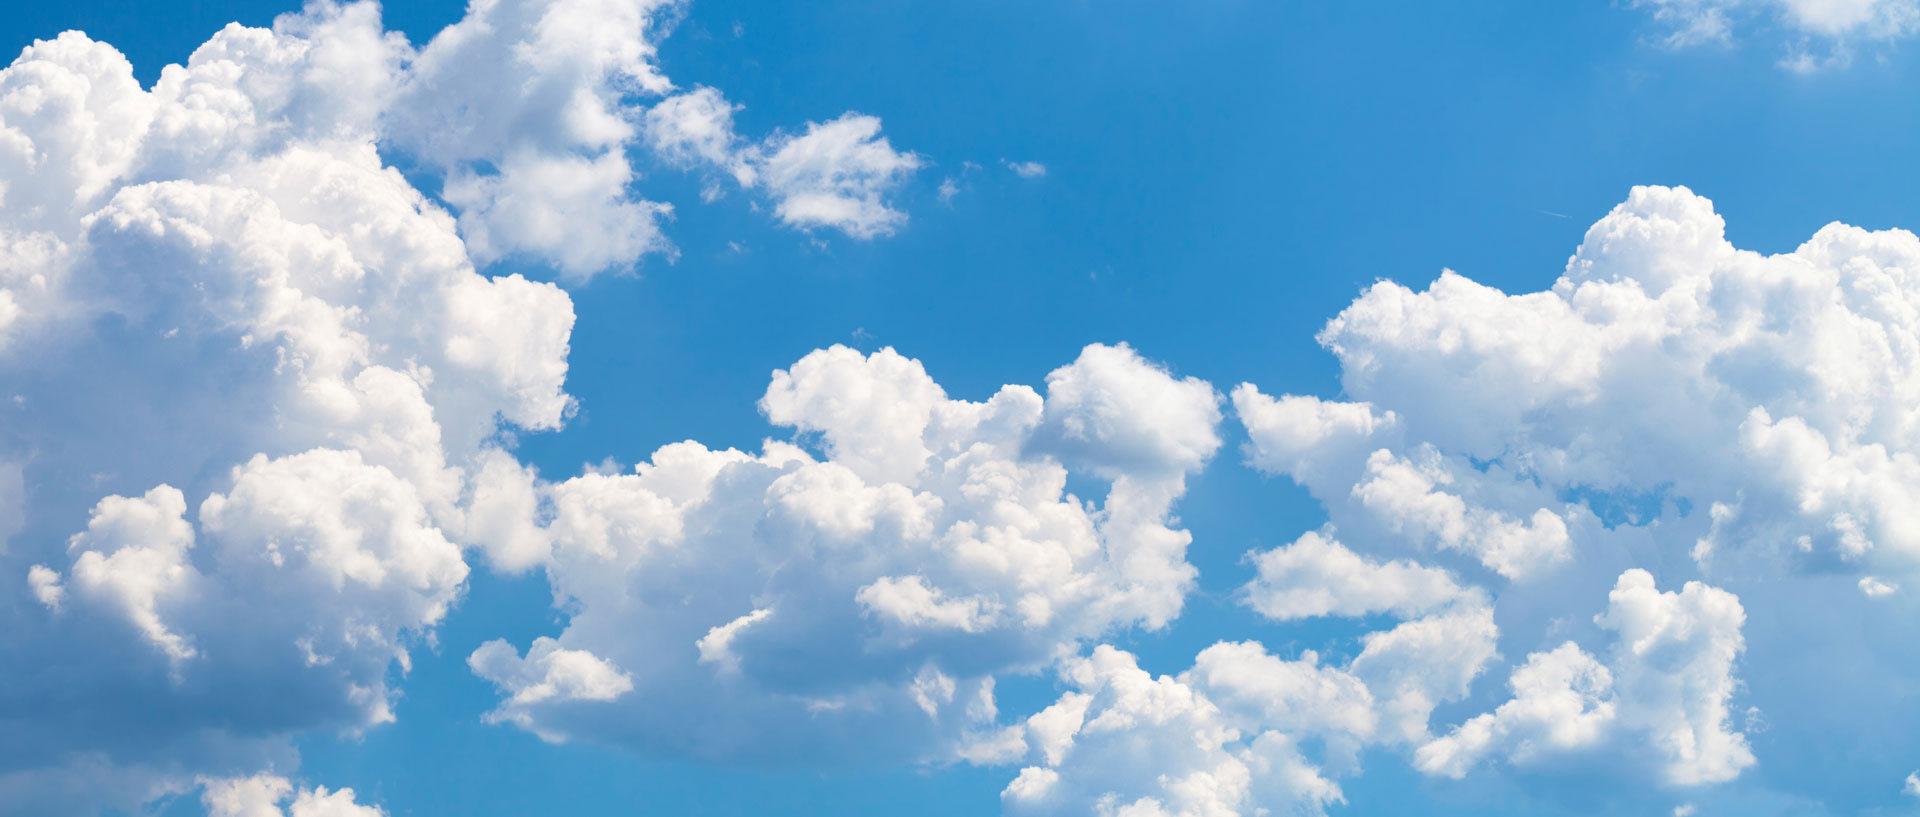 The Best Cloud Storage Services Yahoo Finance